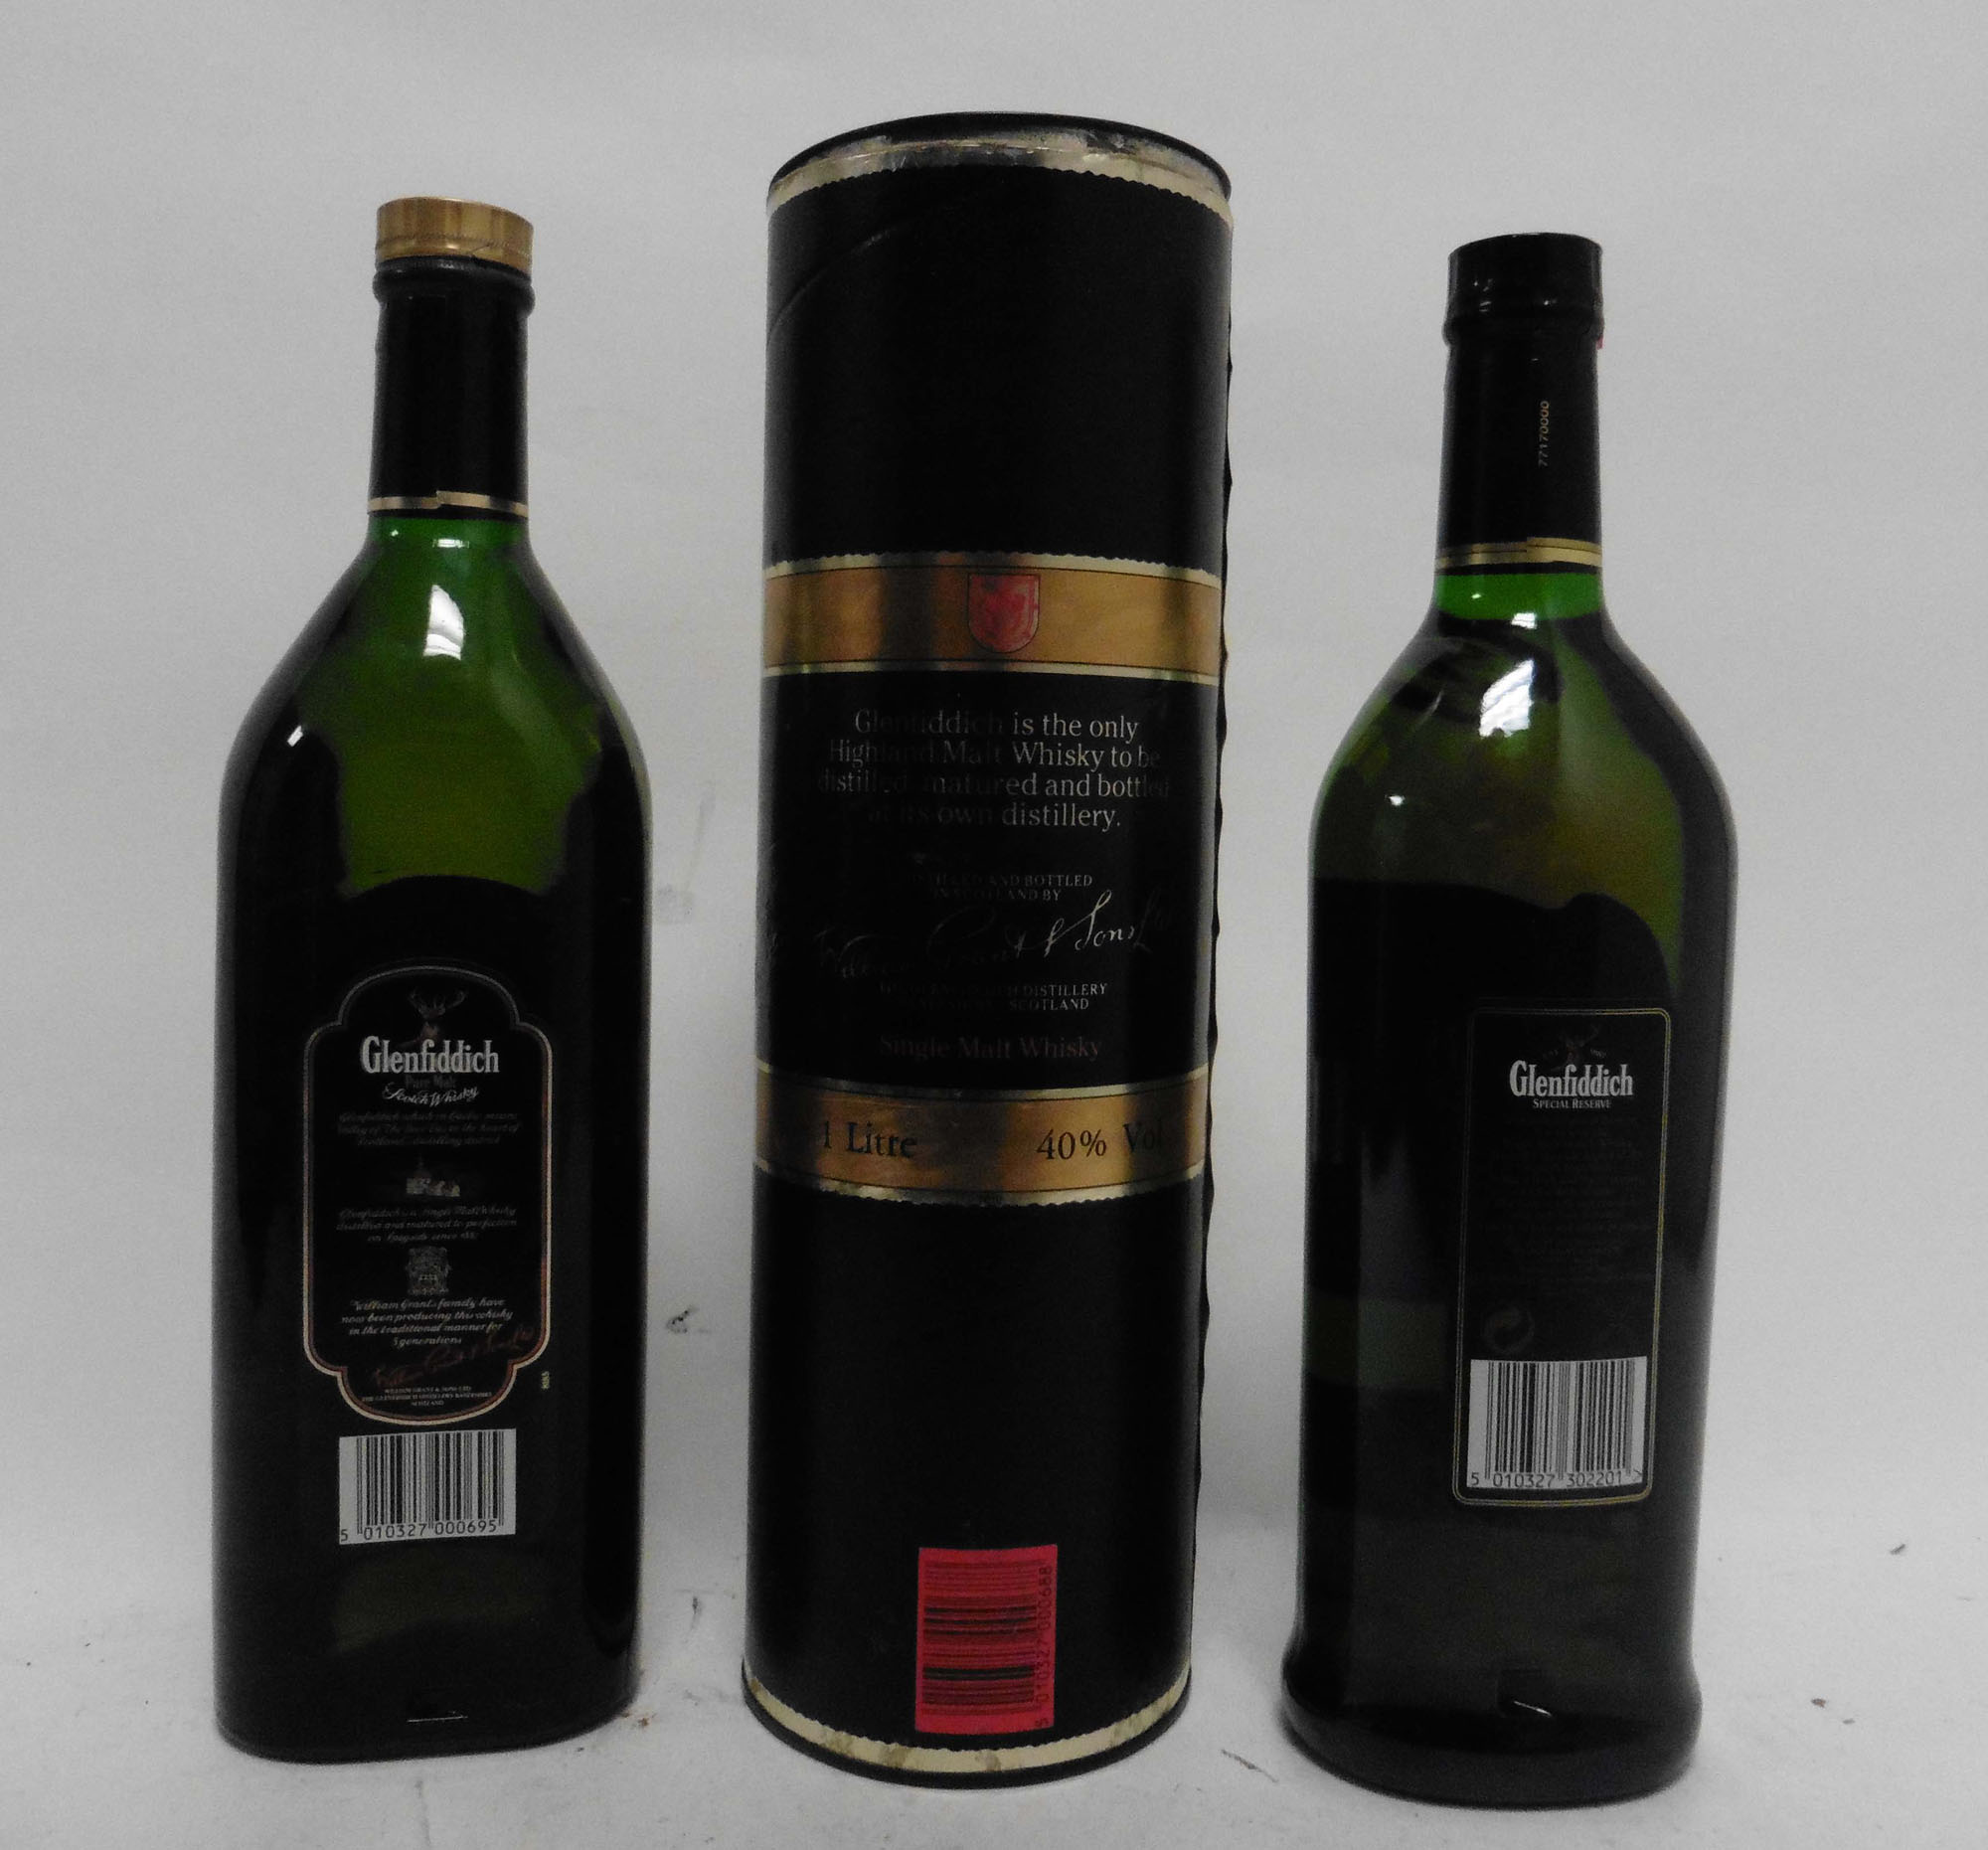 2 bottles of Glenfiddich Single Malt Scotch Whisky, - Image 2 of 2